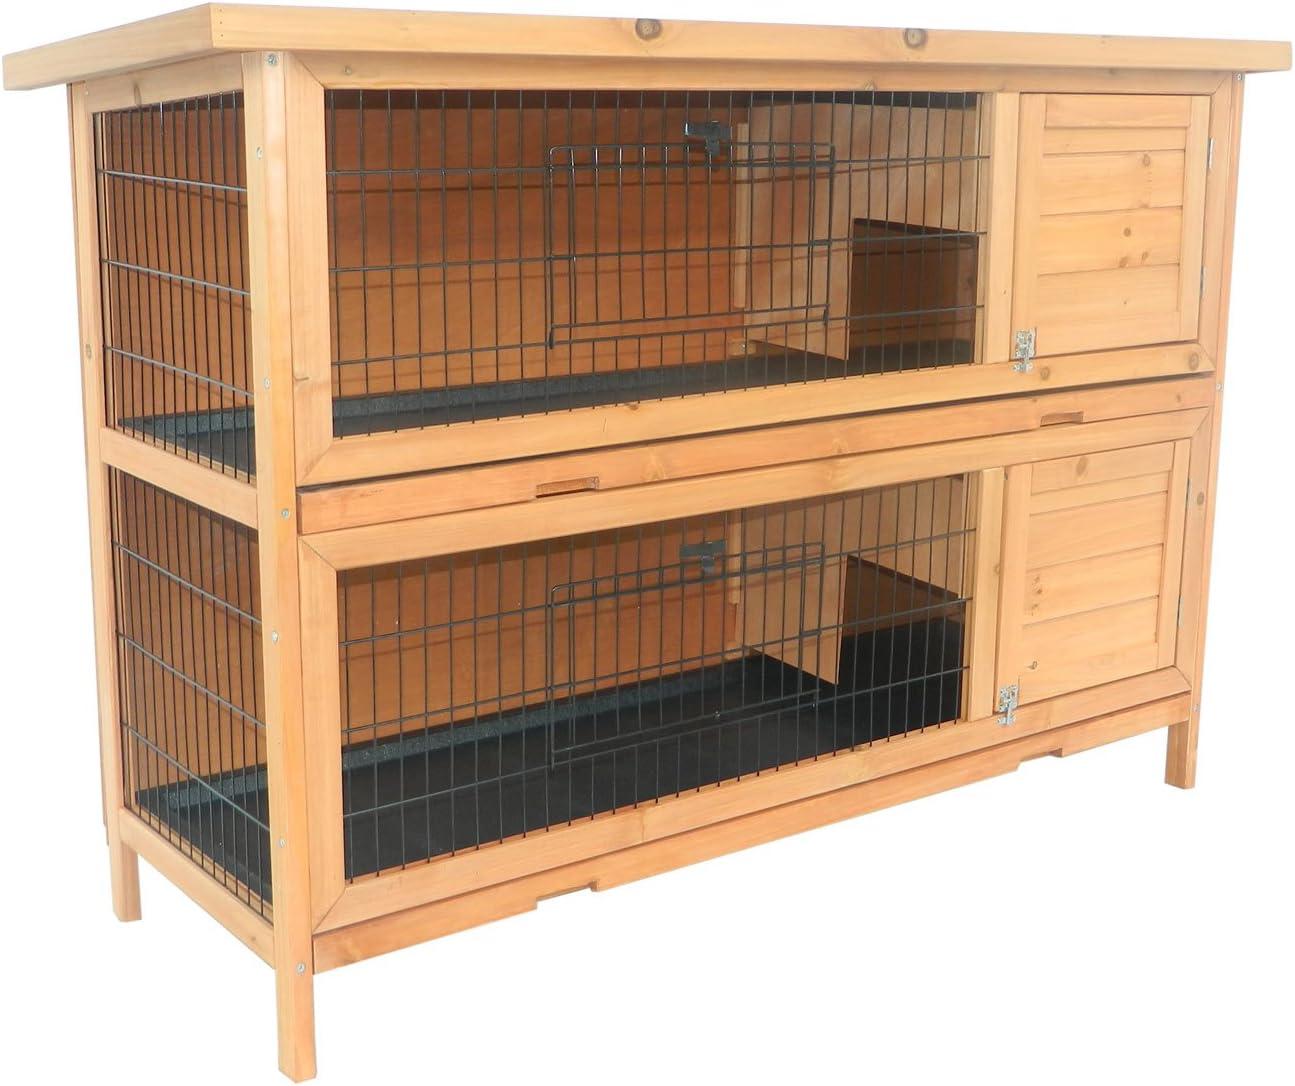 Pawhut Conejera Madera de Exterior Jaula para Conejo Cobaya 2 Niveles Bandeja Extraíble 136.4x50x93cm Casa para Animal Pequeño